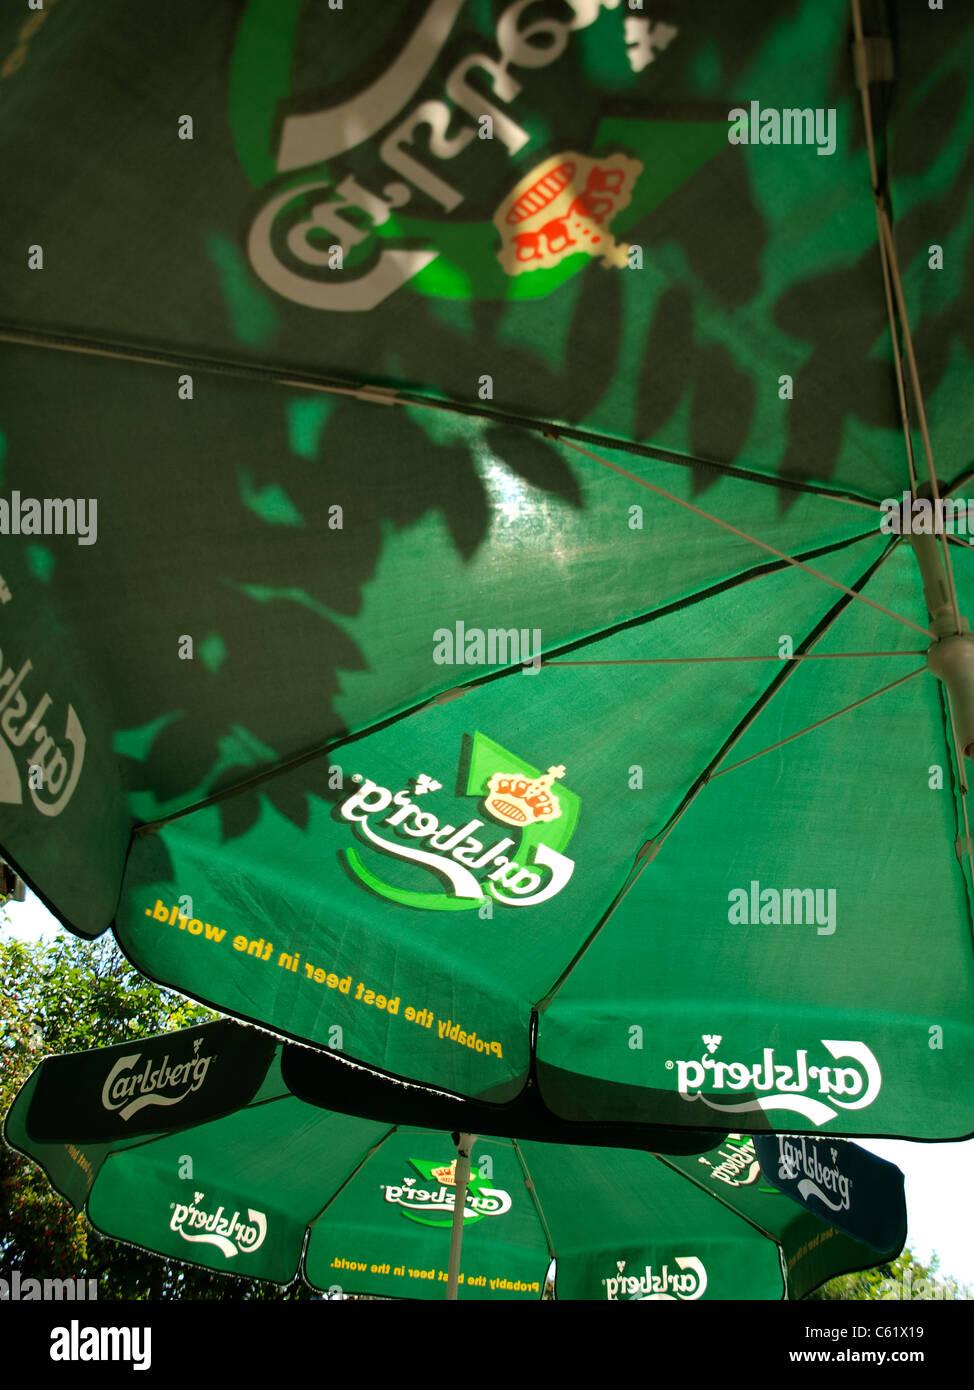 Carlsberg, umbrella int he sun. - Stock Image